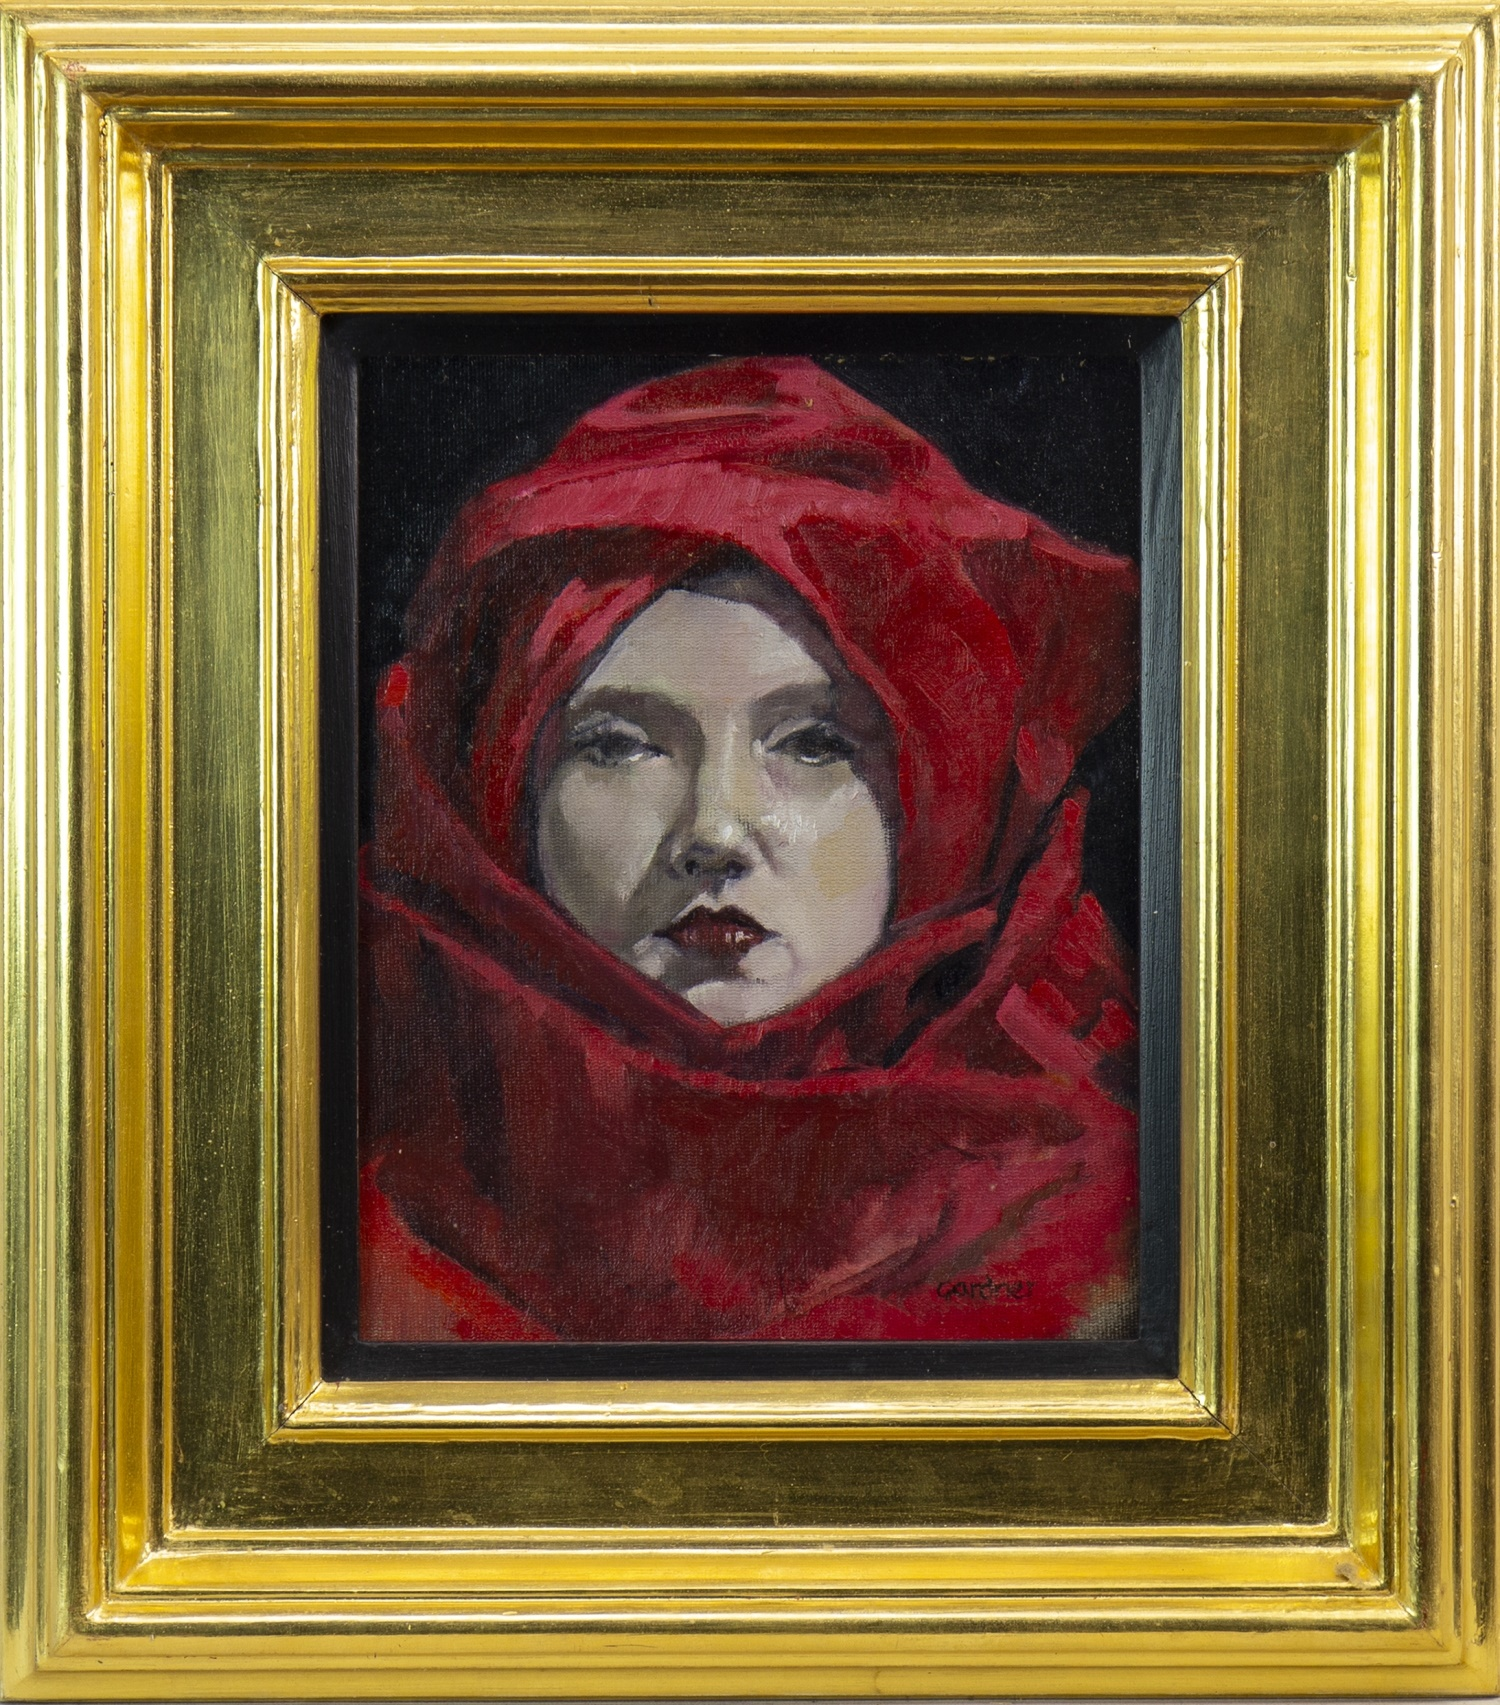 Lot 559 - LADY IN RED, AN OIL BY SANDIE GARDNER